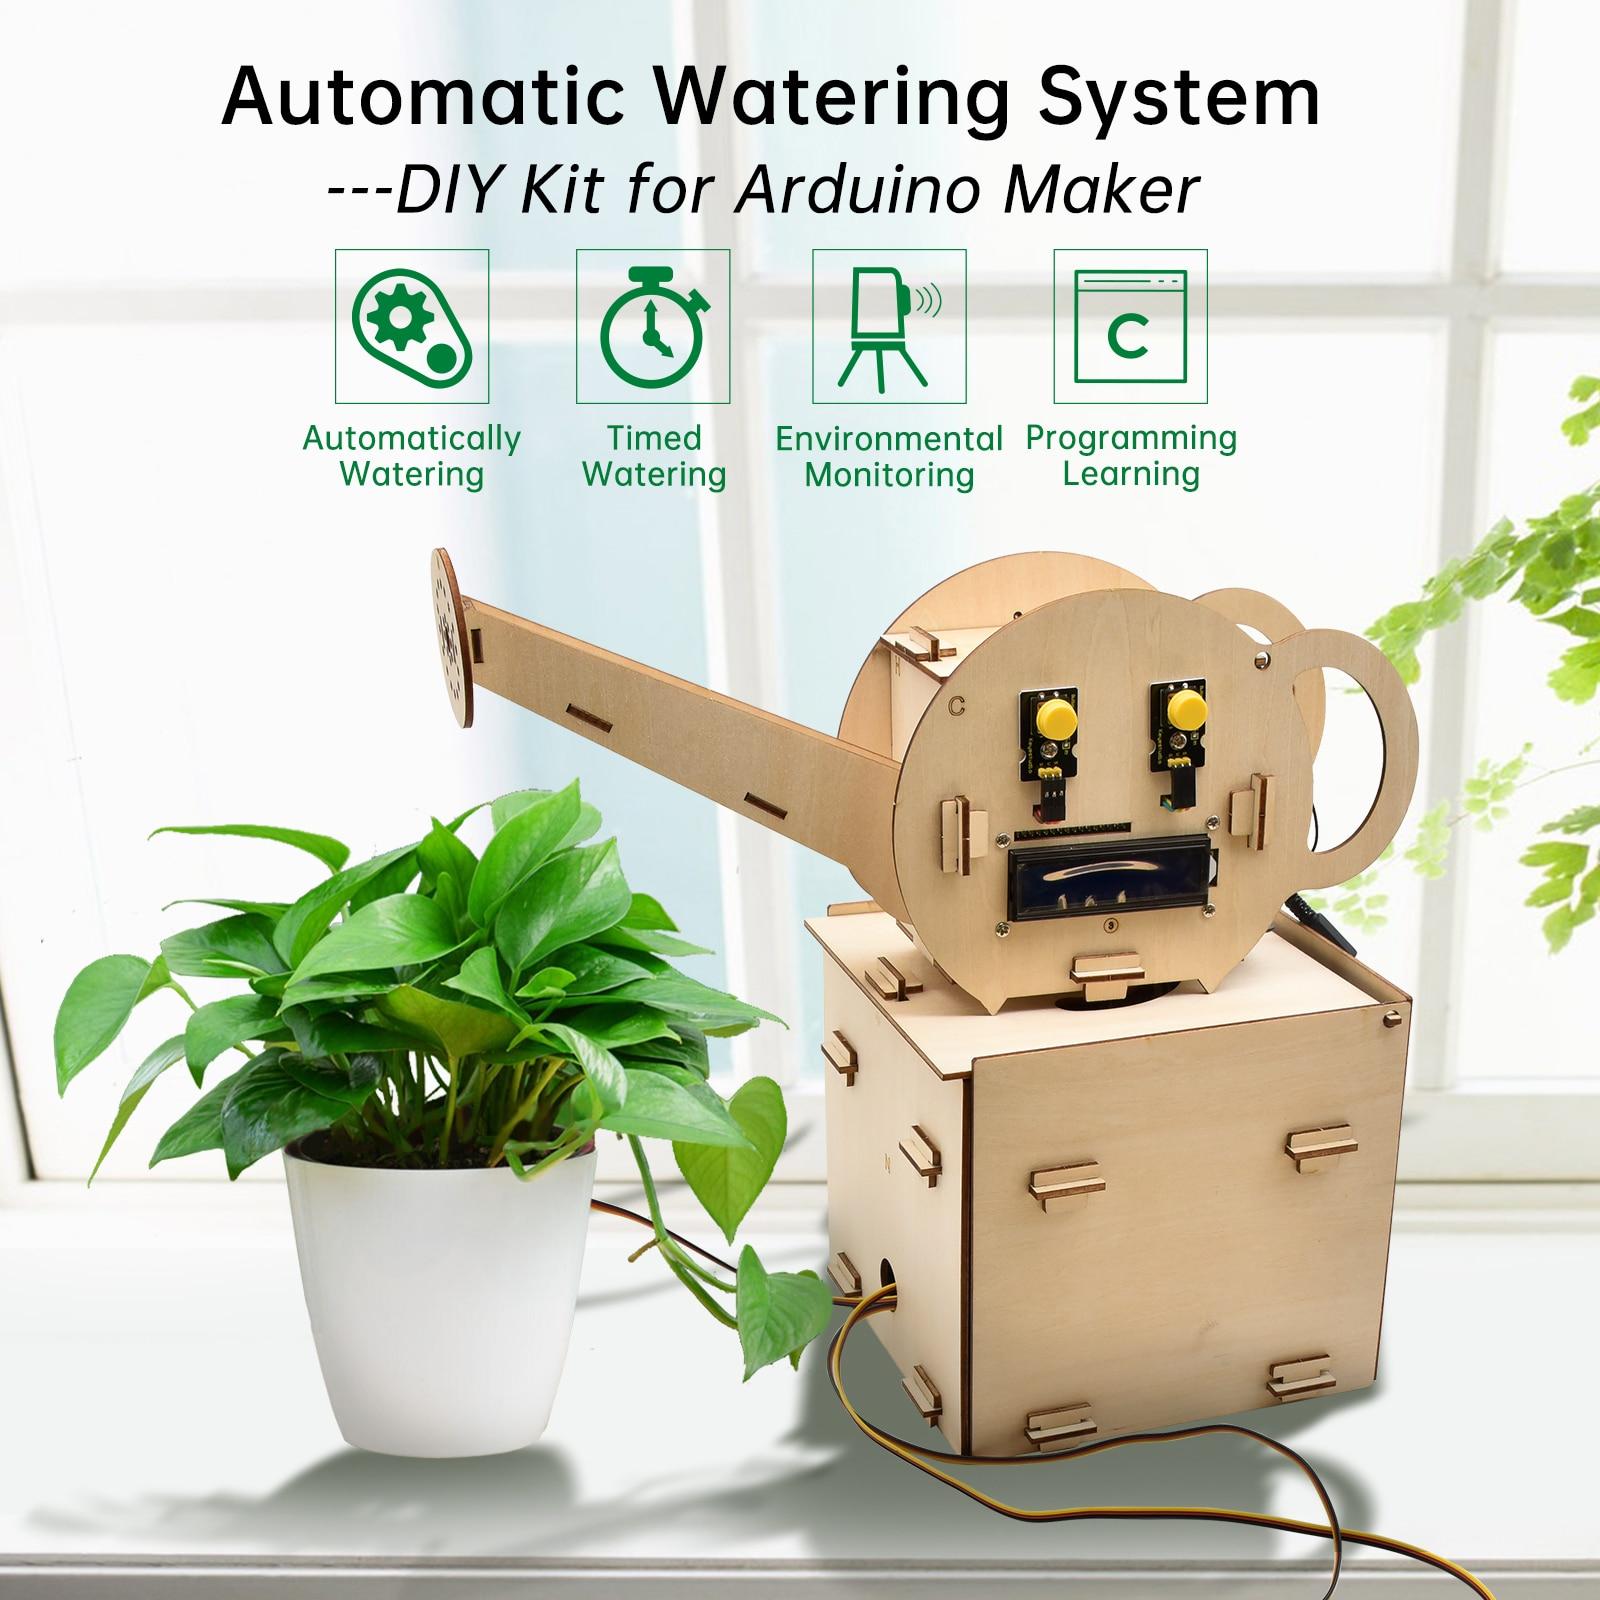 Keyestudio Automatic Watering Starter  Kit Learning Kit for Arduino Watering Kit STEM DIY Projects Programming Kit